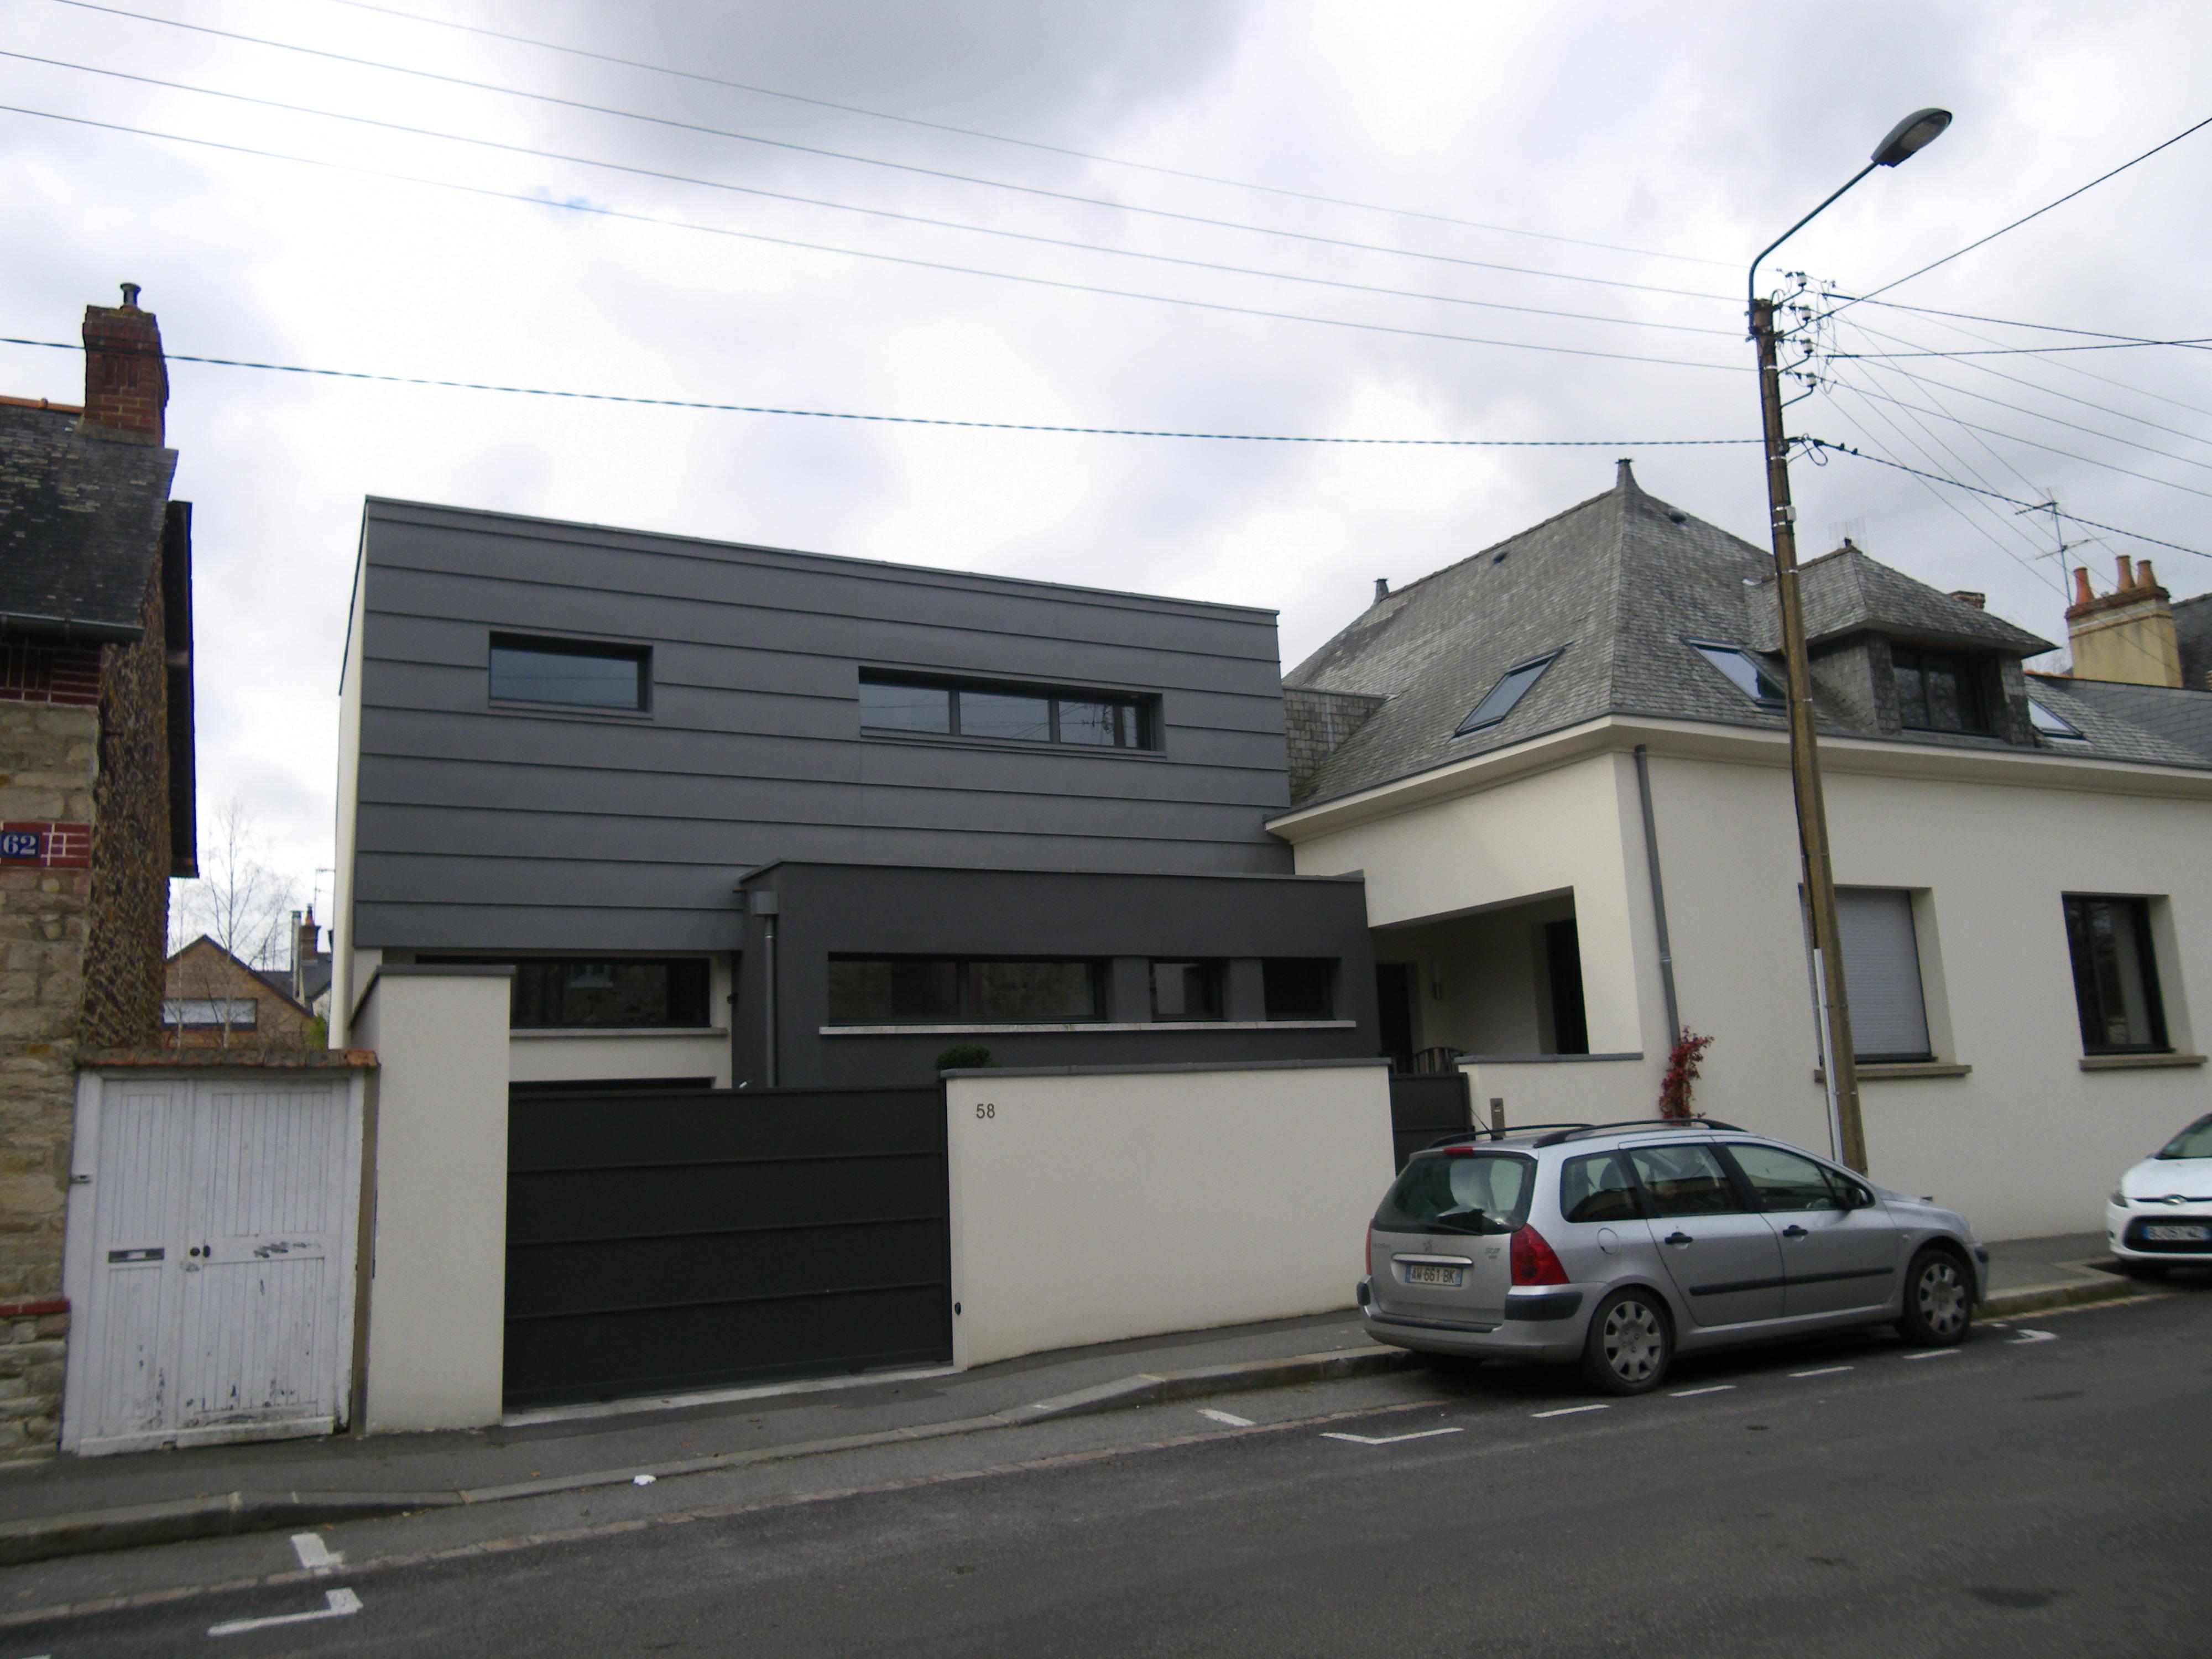 Appealing maison moderne rennes gallery best image for Maison moderne rennes